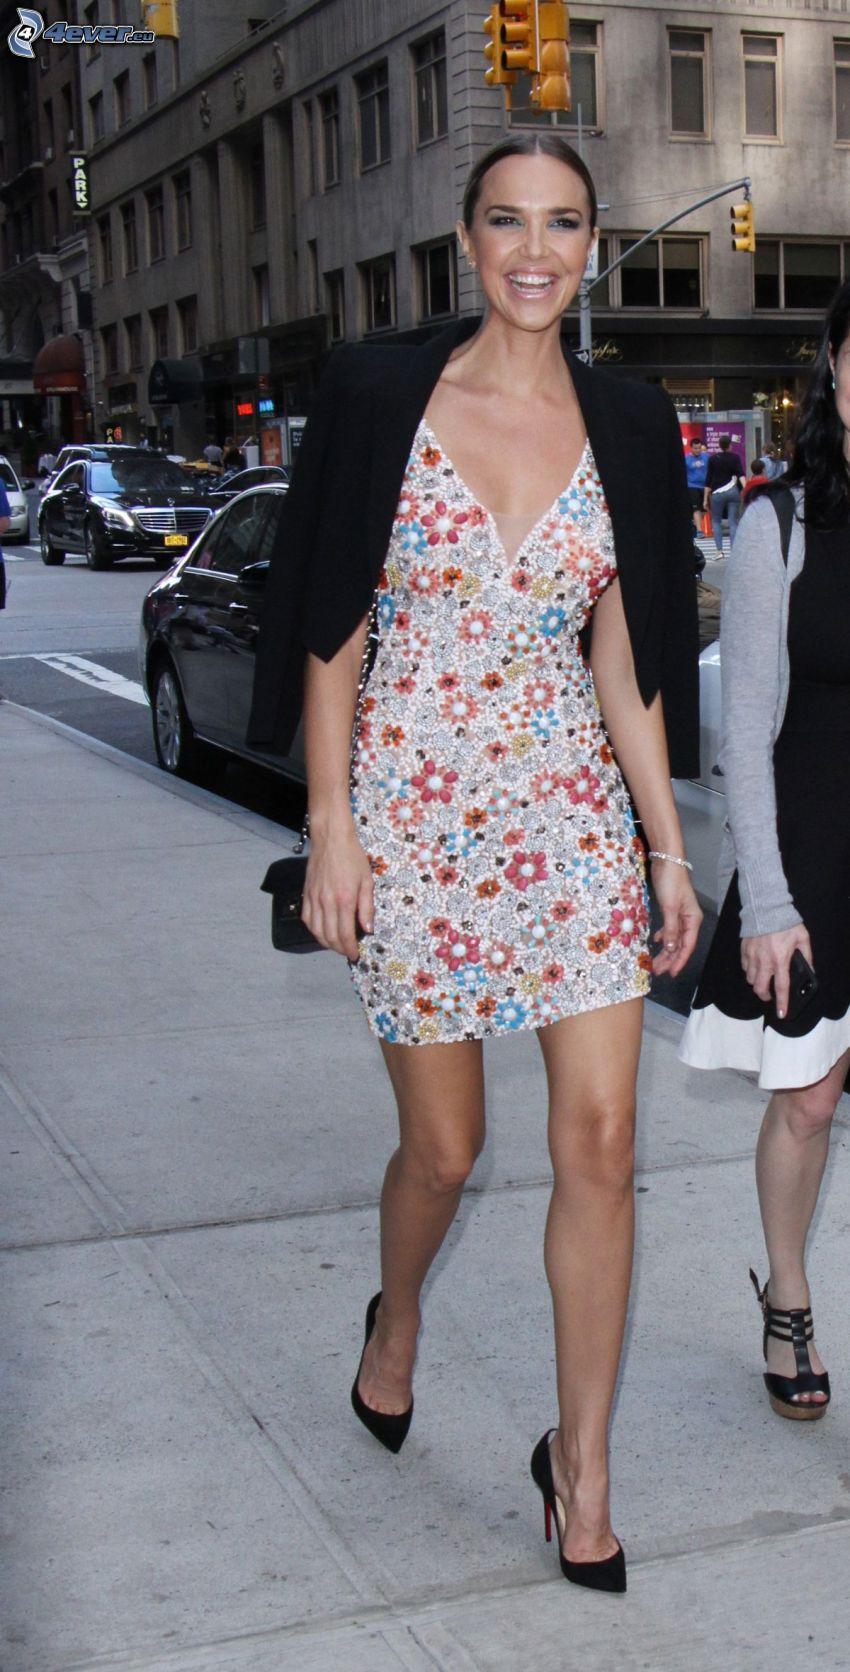 Arielle Kebbel, rire, escarpins, robe de fleurs, rue